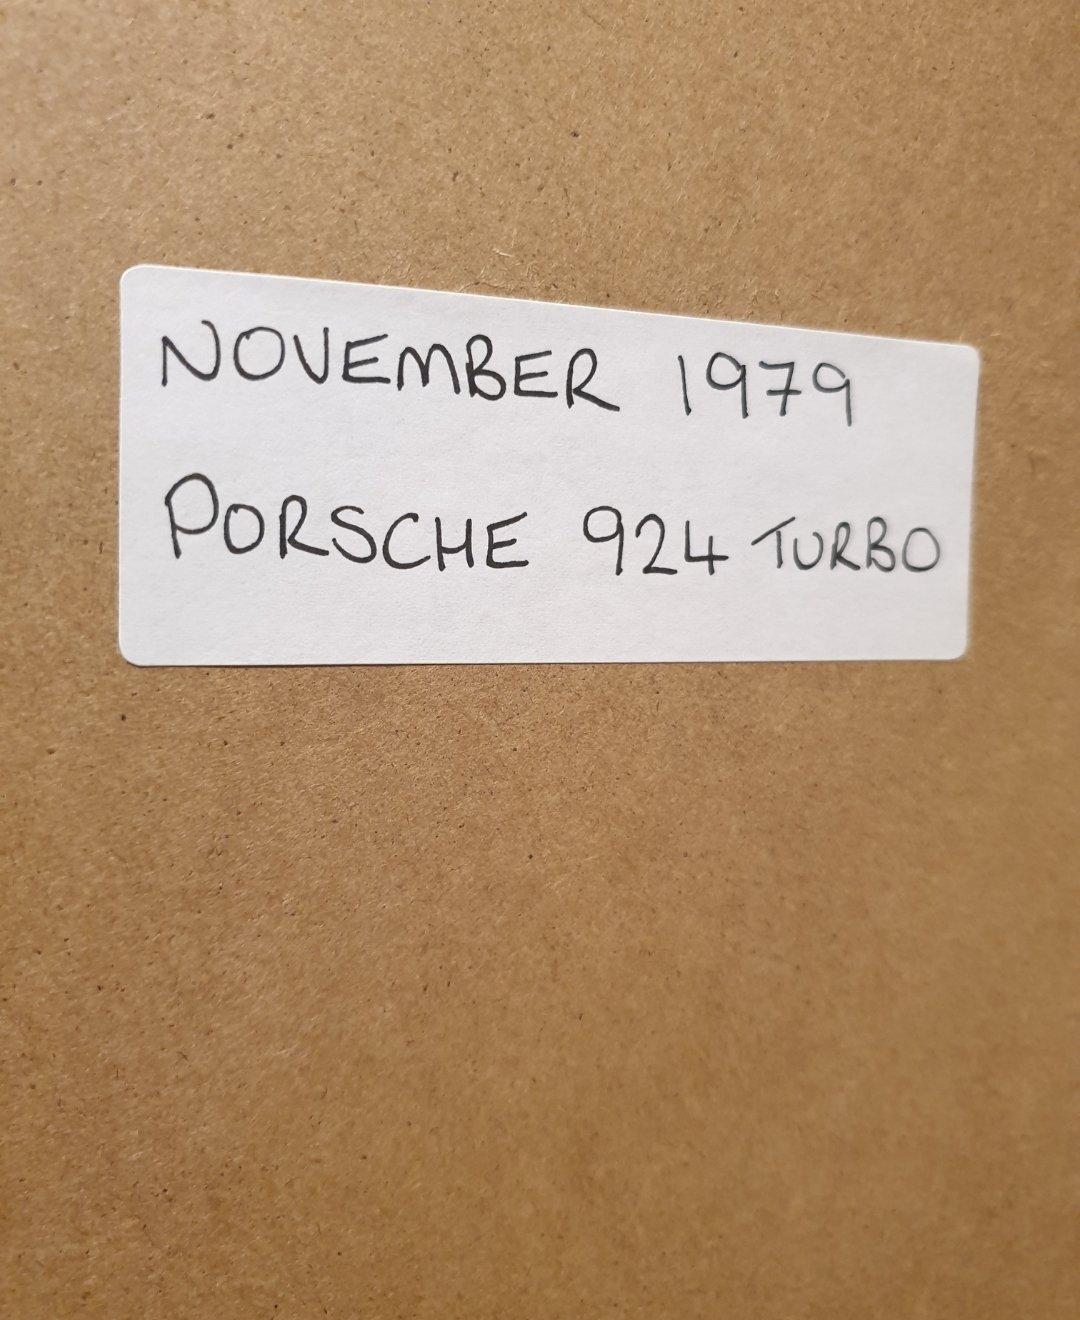 1979 Porsche 924 Turbo Framed Advert Original  For Sale (picture 2 of 3)